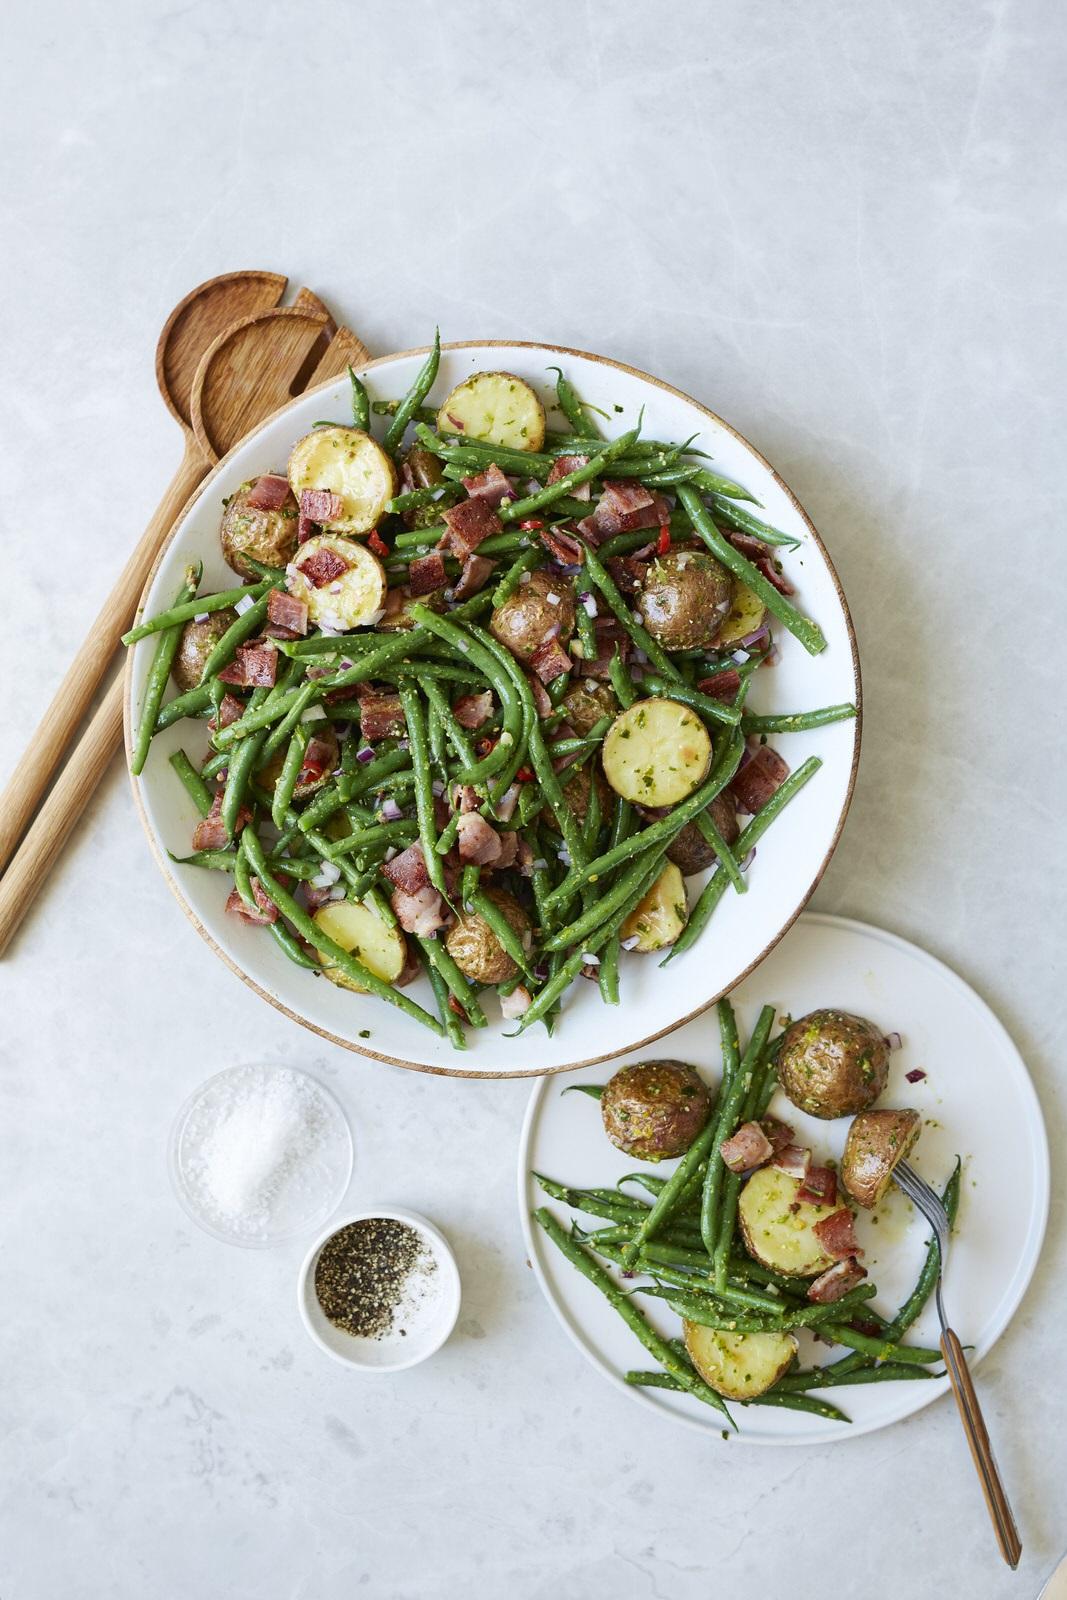 Pesto Princess Bacon and Potato Salad